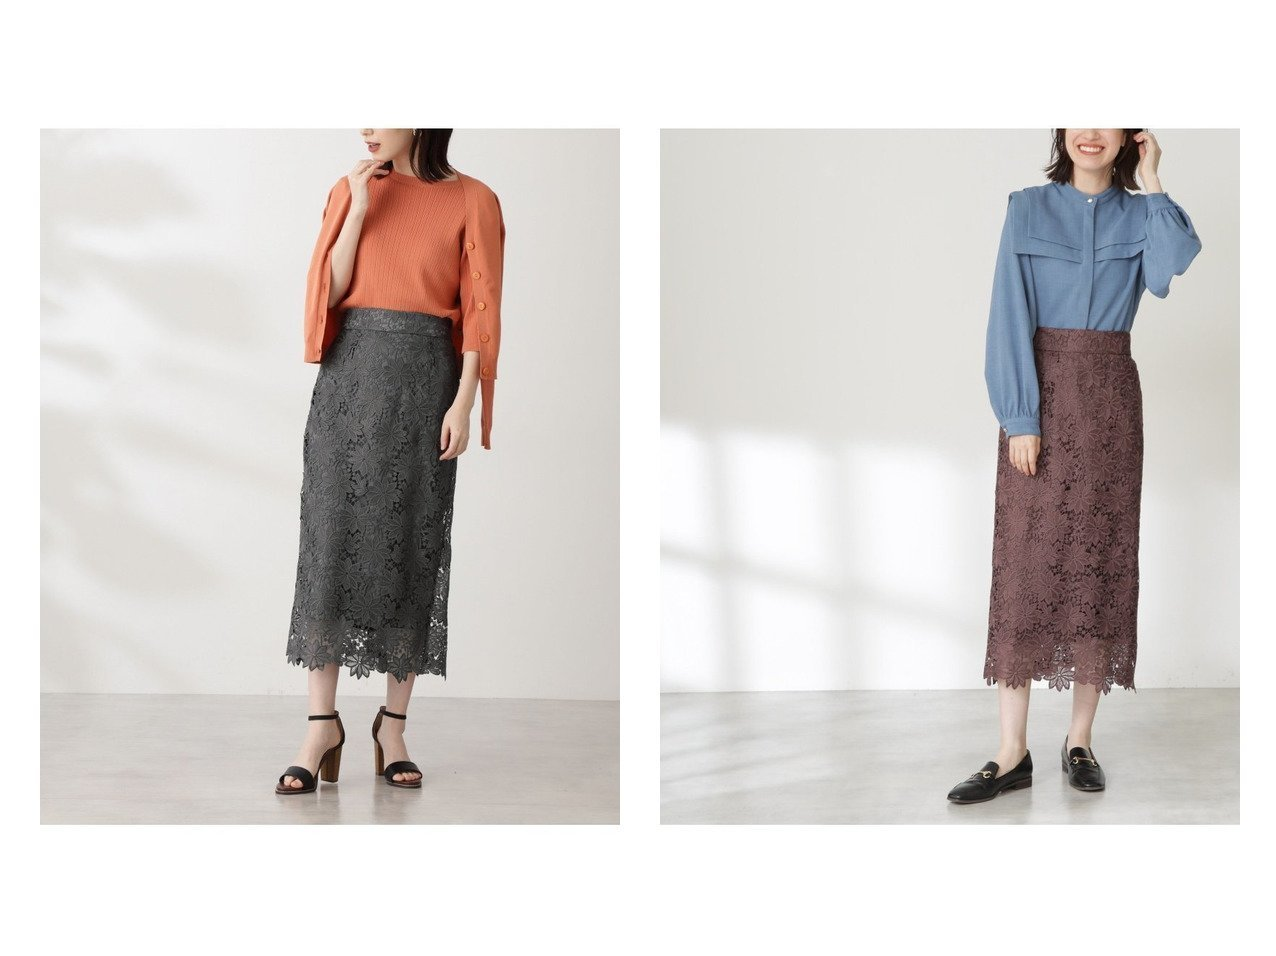 【N.Natural Beauty basic/エヌ ナチュラルビューティーベーシック】のケミカルレースロングスカート 【スカート】おすすめ!人気、トレンド・レディースファッションの通販 おすすめで人気の流行・トレンド、ファッションの通販商品 インテリア・家具・メンズファッション・キッズファッション・レディースファッション・服の通販 founy(ファニー) https://founy.com/ ファッション Fashion レディースファッション WOMEN スカート Skirt ロングスカート Long Skirt ケミカル スカラップ ストレート レース ロング 人気 定番 Standard  ID:crp329100000070091